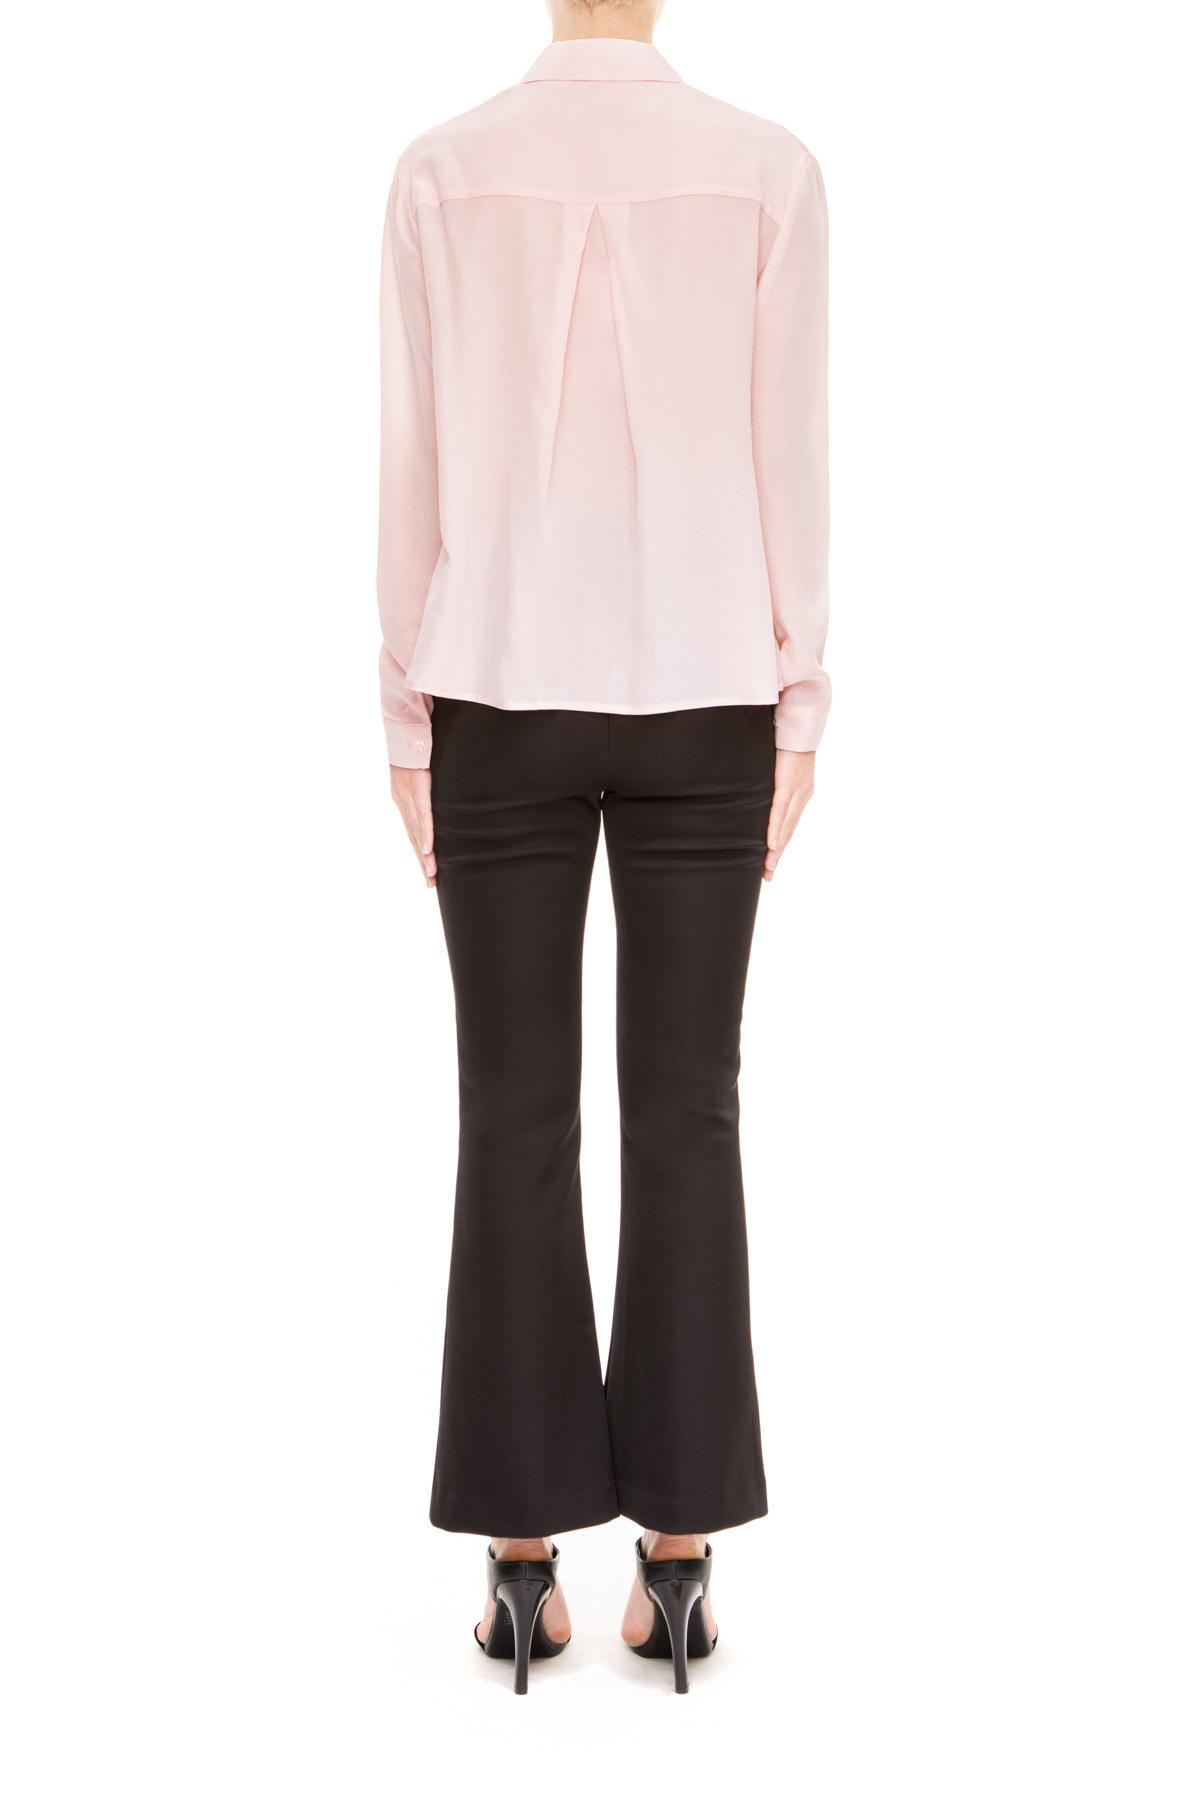 Lyst keepsake stolen heart silk long sleeve shirt in pink for Silk long sleeve shirt